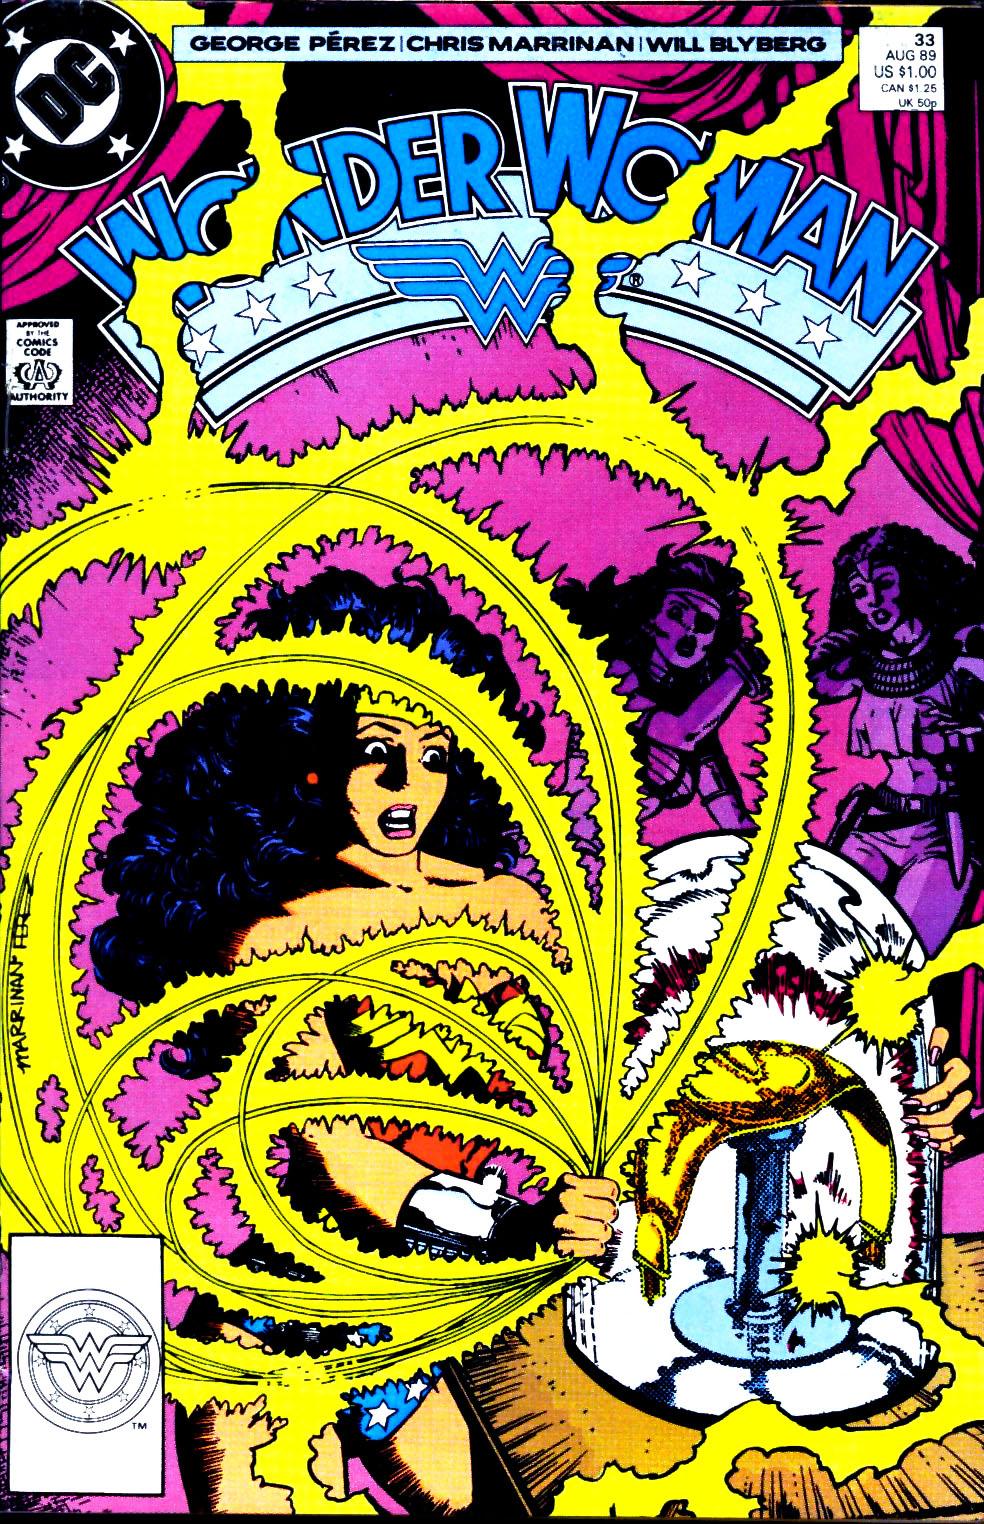 Read online Wonder Woman (1987) comic -  Issue #33 - 1